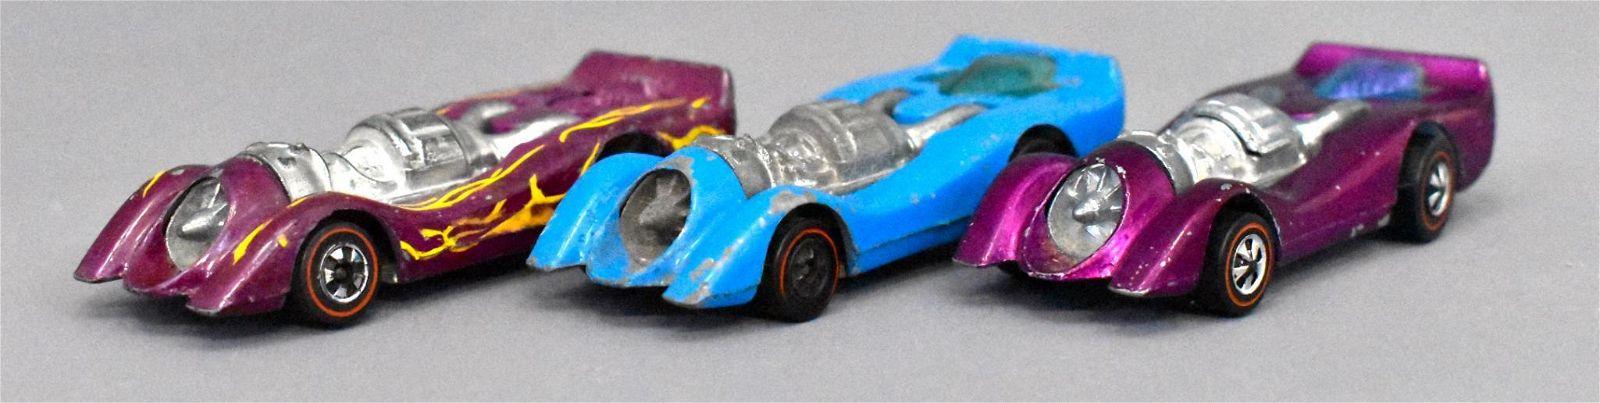 Group of three Mattel Redline Hot Wheels Jet Threats